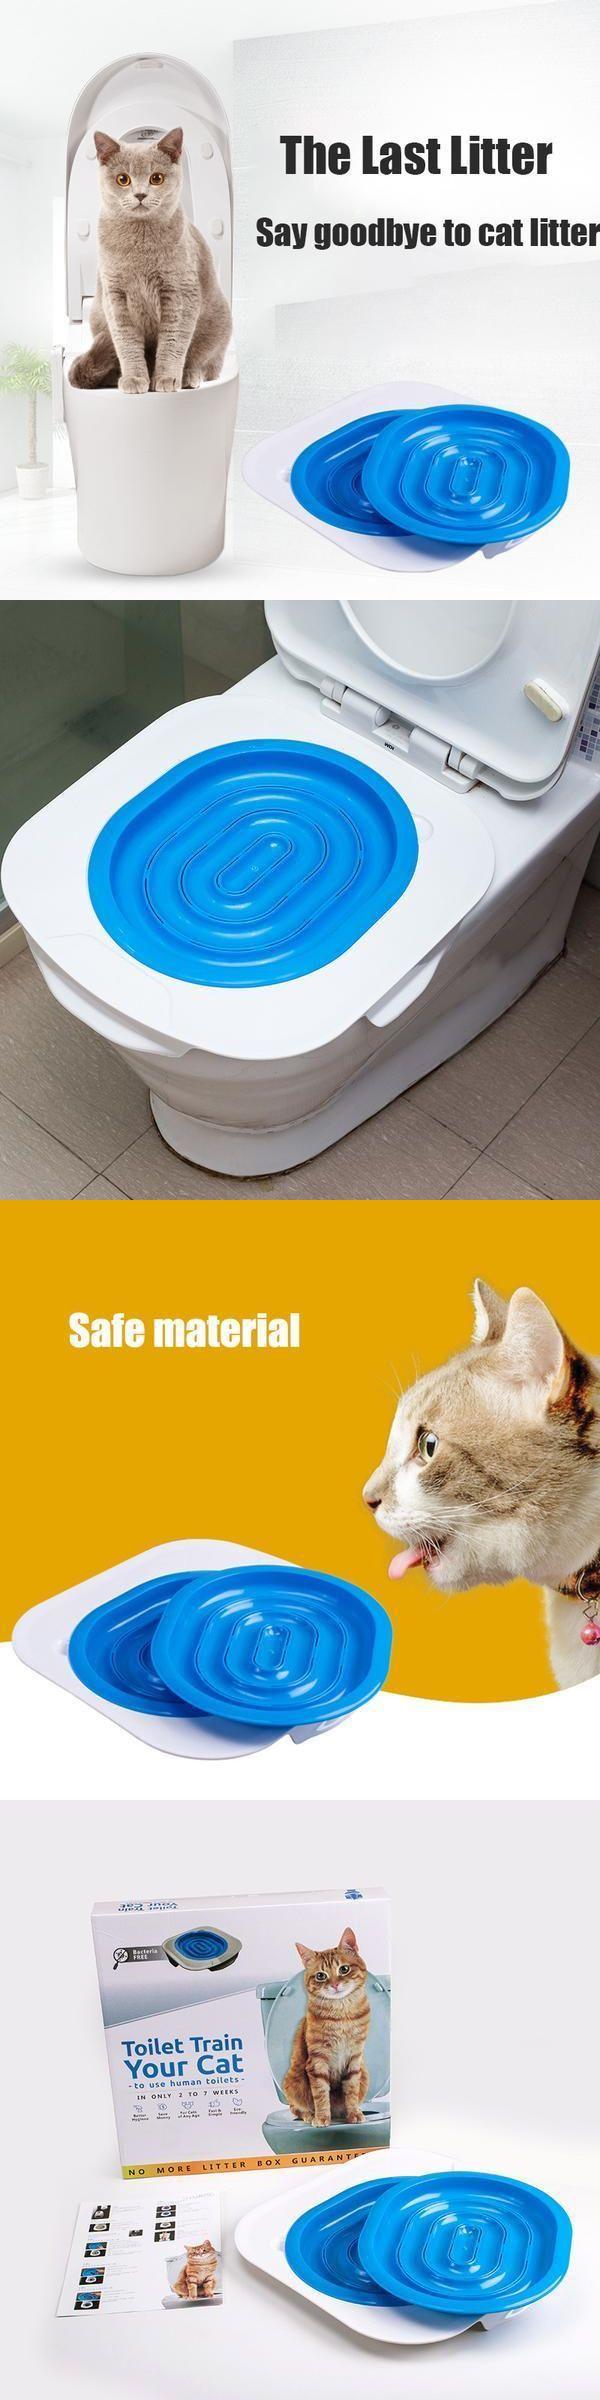 Behavior Training 116361: 2017 Hot Cat Toilet Seats Training Kit System For Cats Training Behavior -> BUY IT NOW ONLY: $38 on eBay!